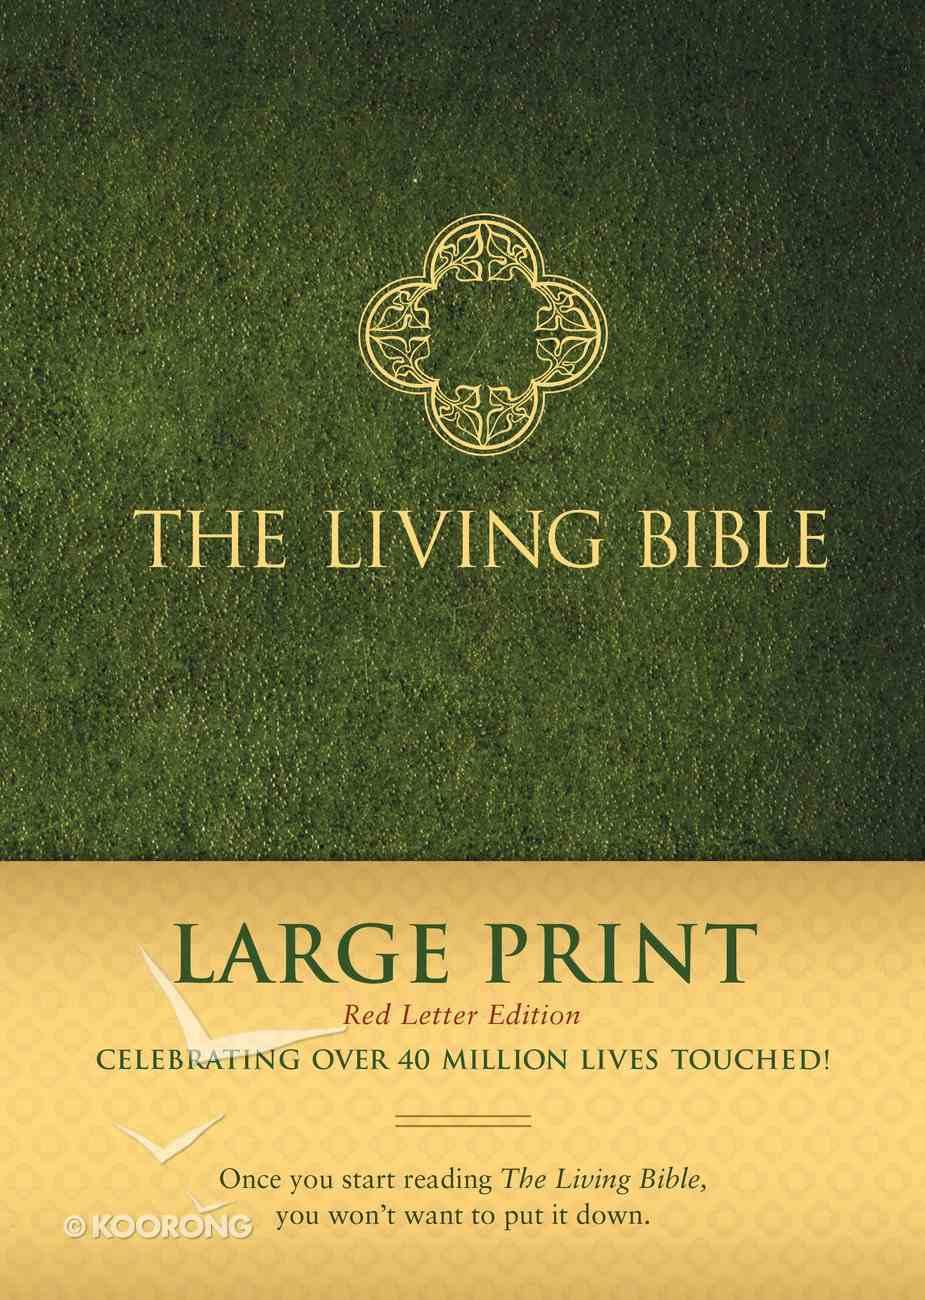 Lbp Living Bible Large Print Green (Red Letter Edition) Hardback